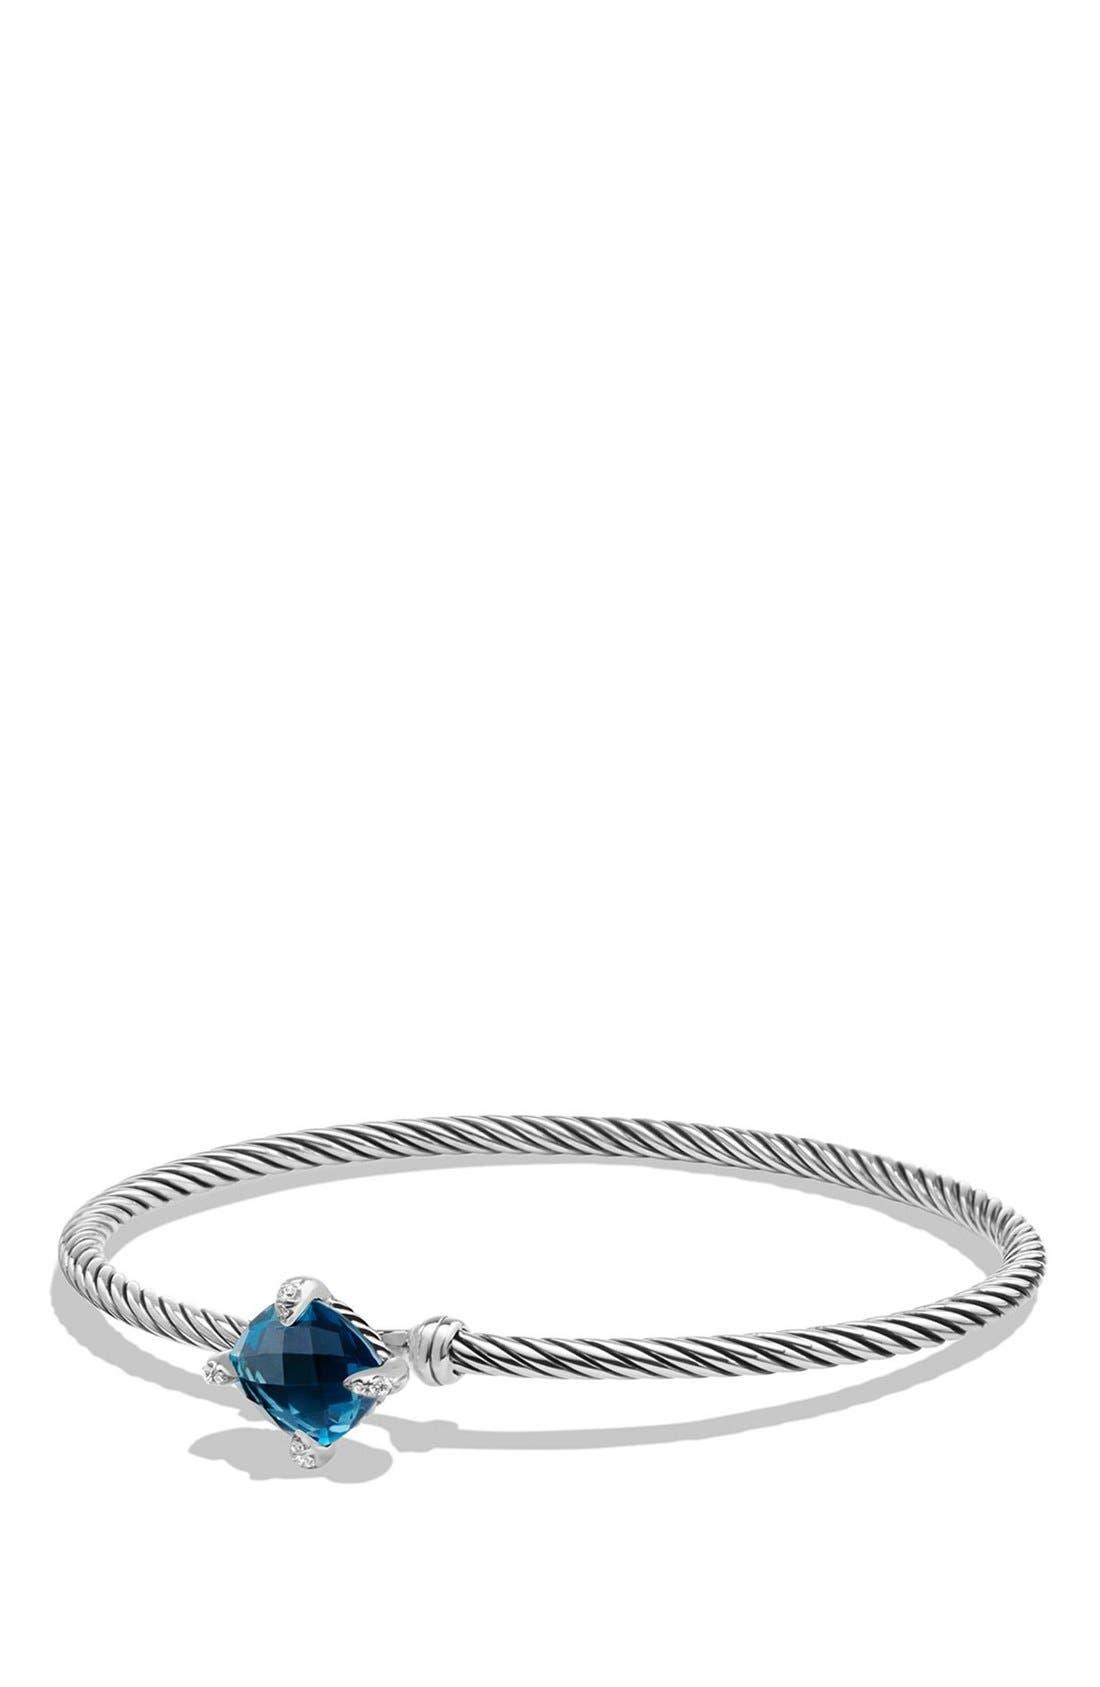 Main Image - David Yurman 'Châtelaine' Bracelet with Diamonds